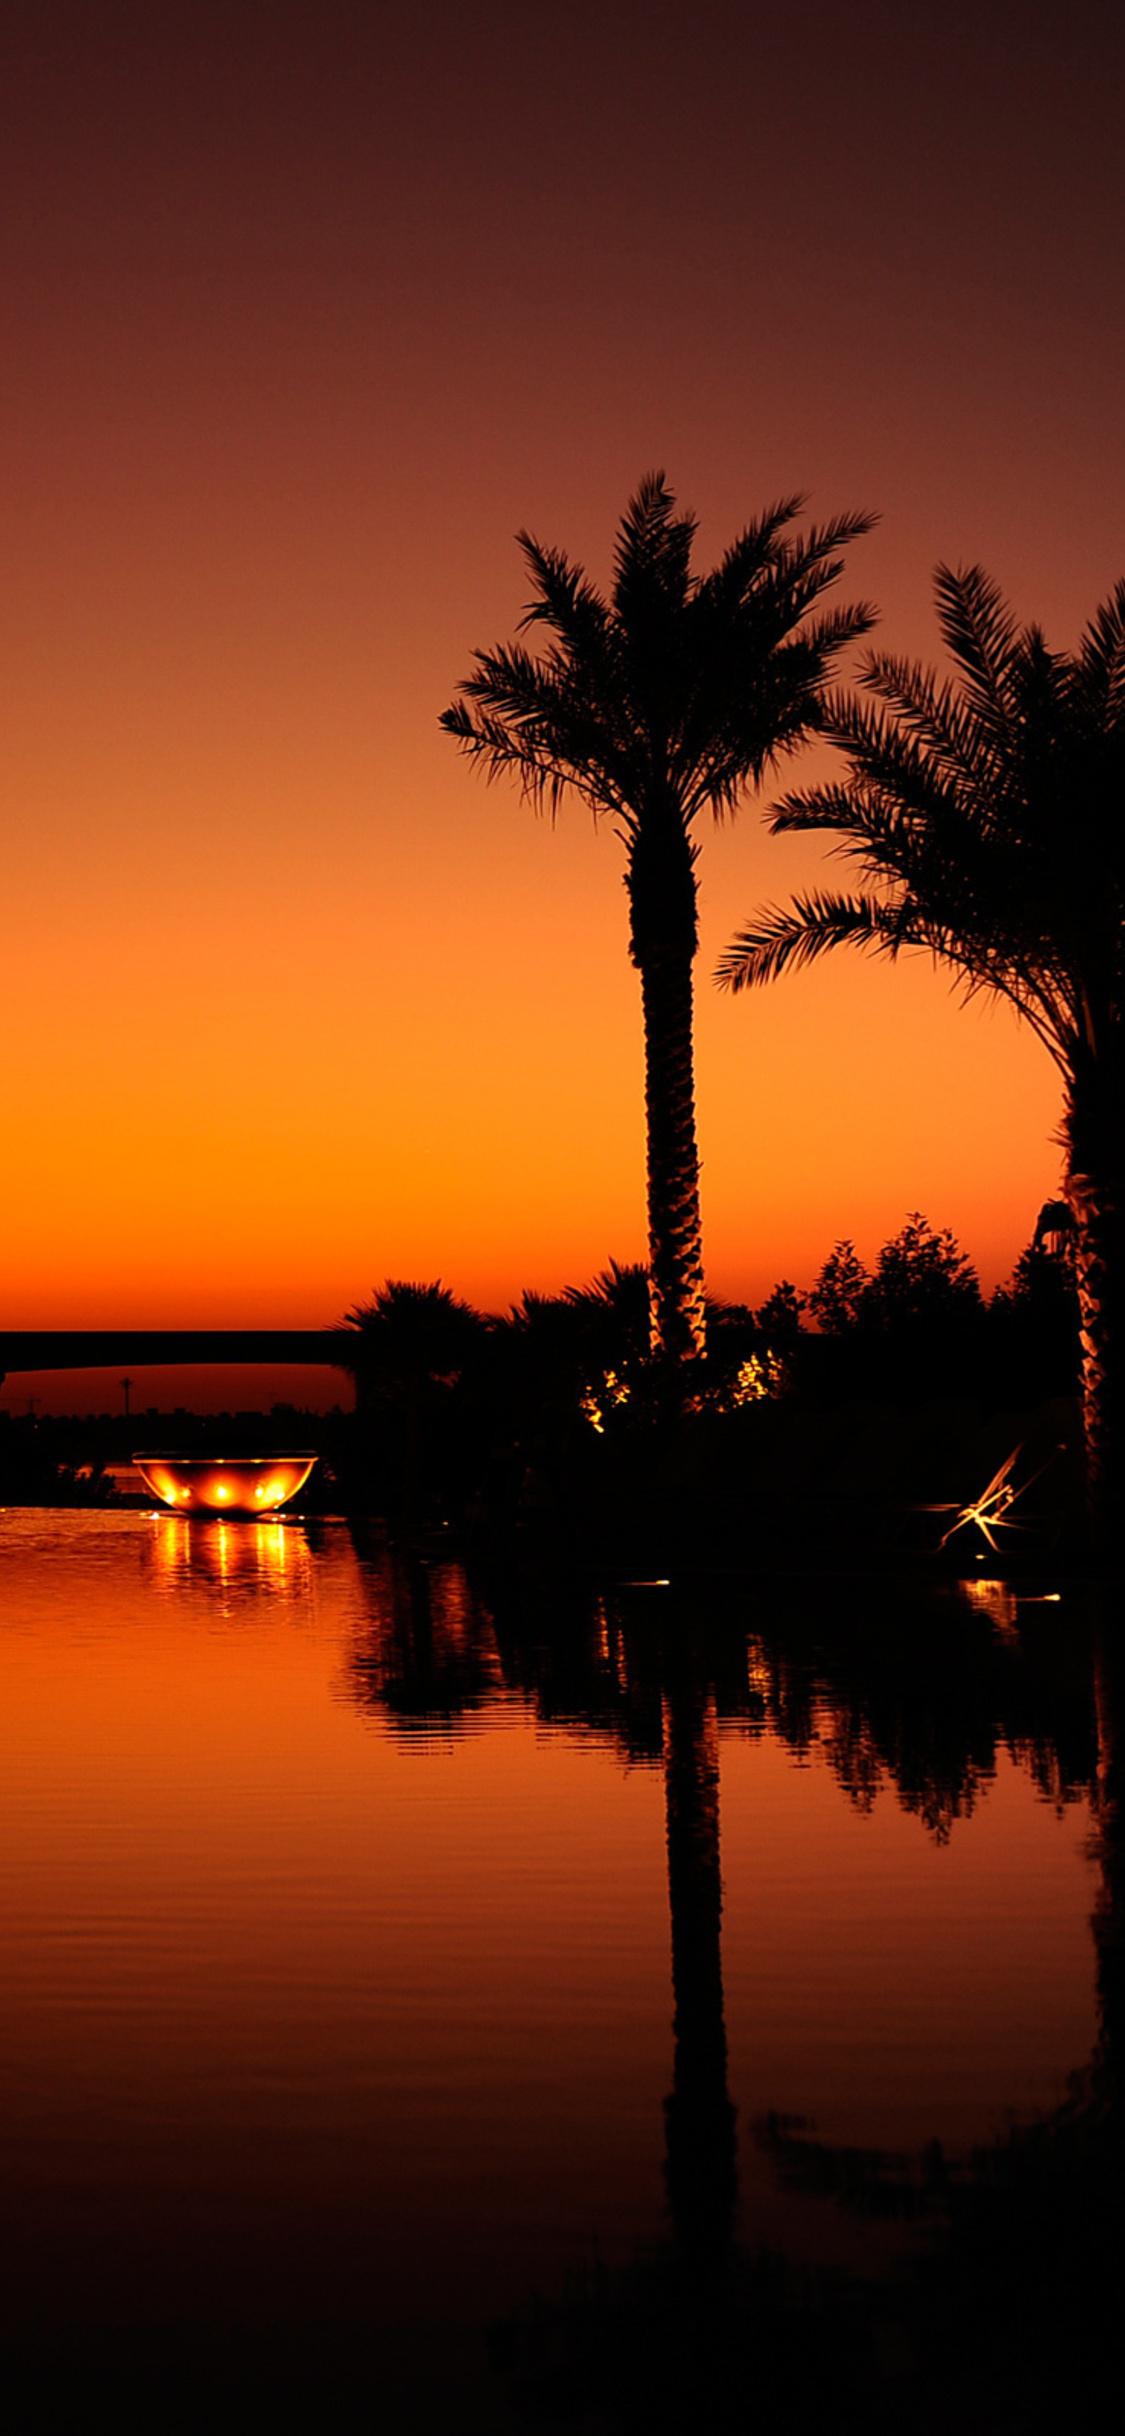 1125x2436 Dubai Palm Trees Sunset Reflection Iphone Xs